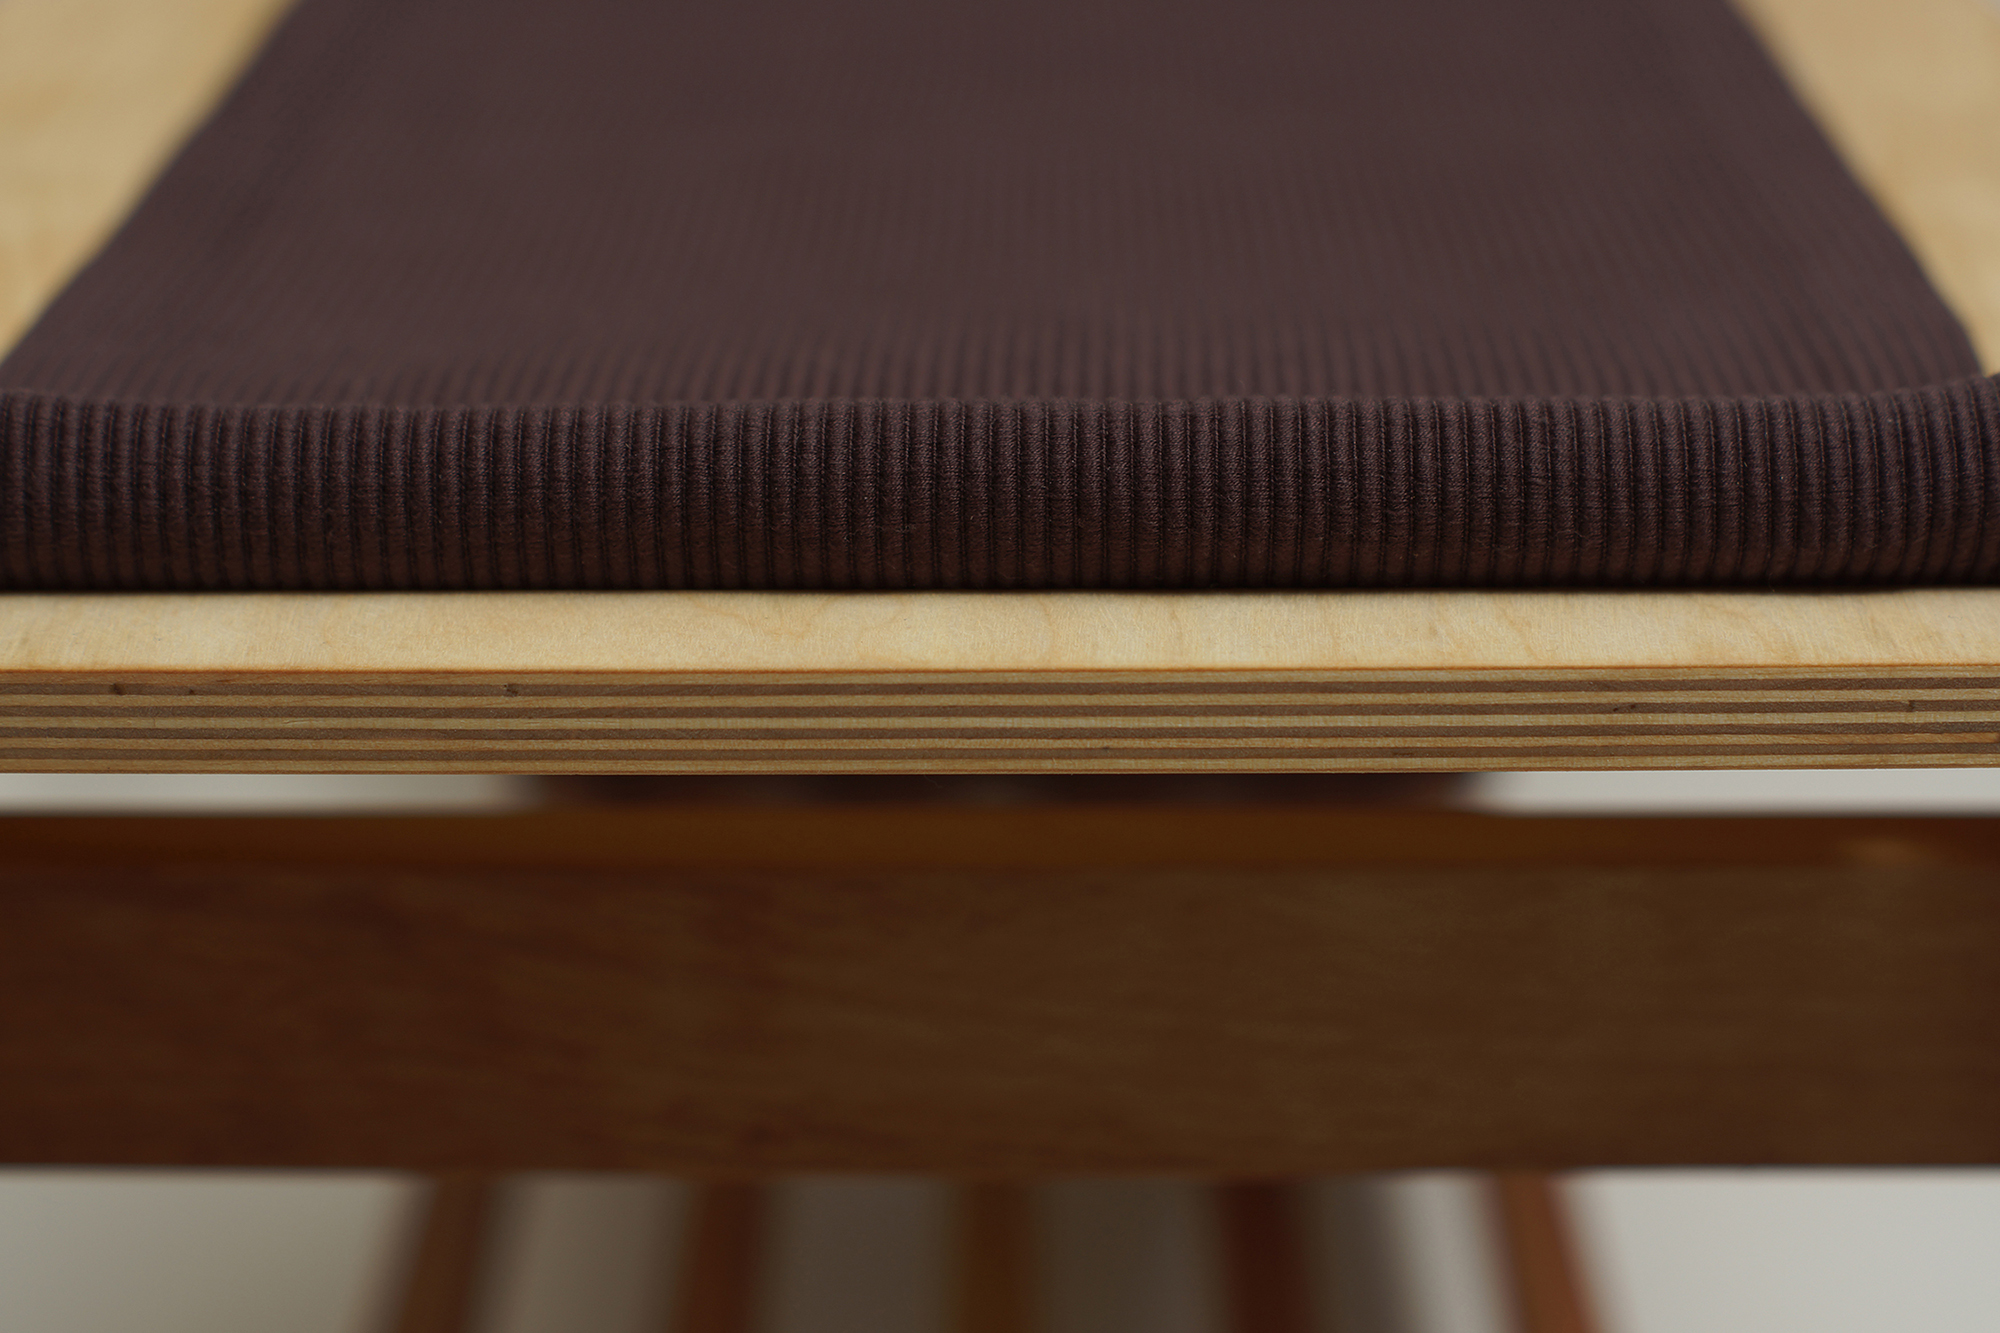 Dezső Ilona - Download Design - Bench with hanger 02.jpg